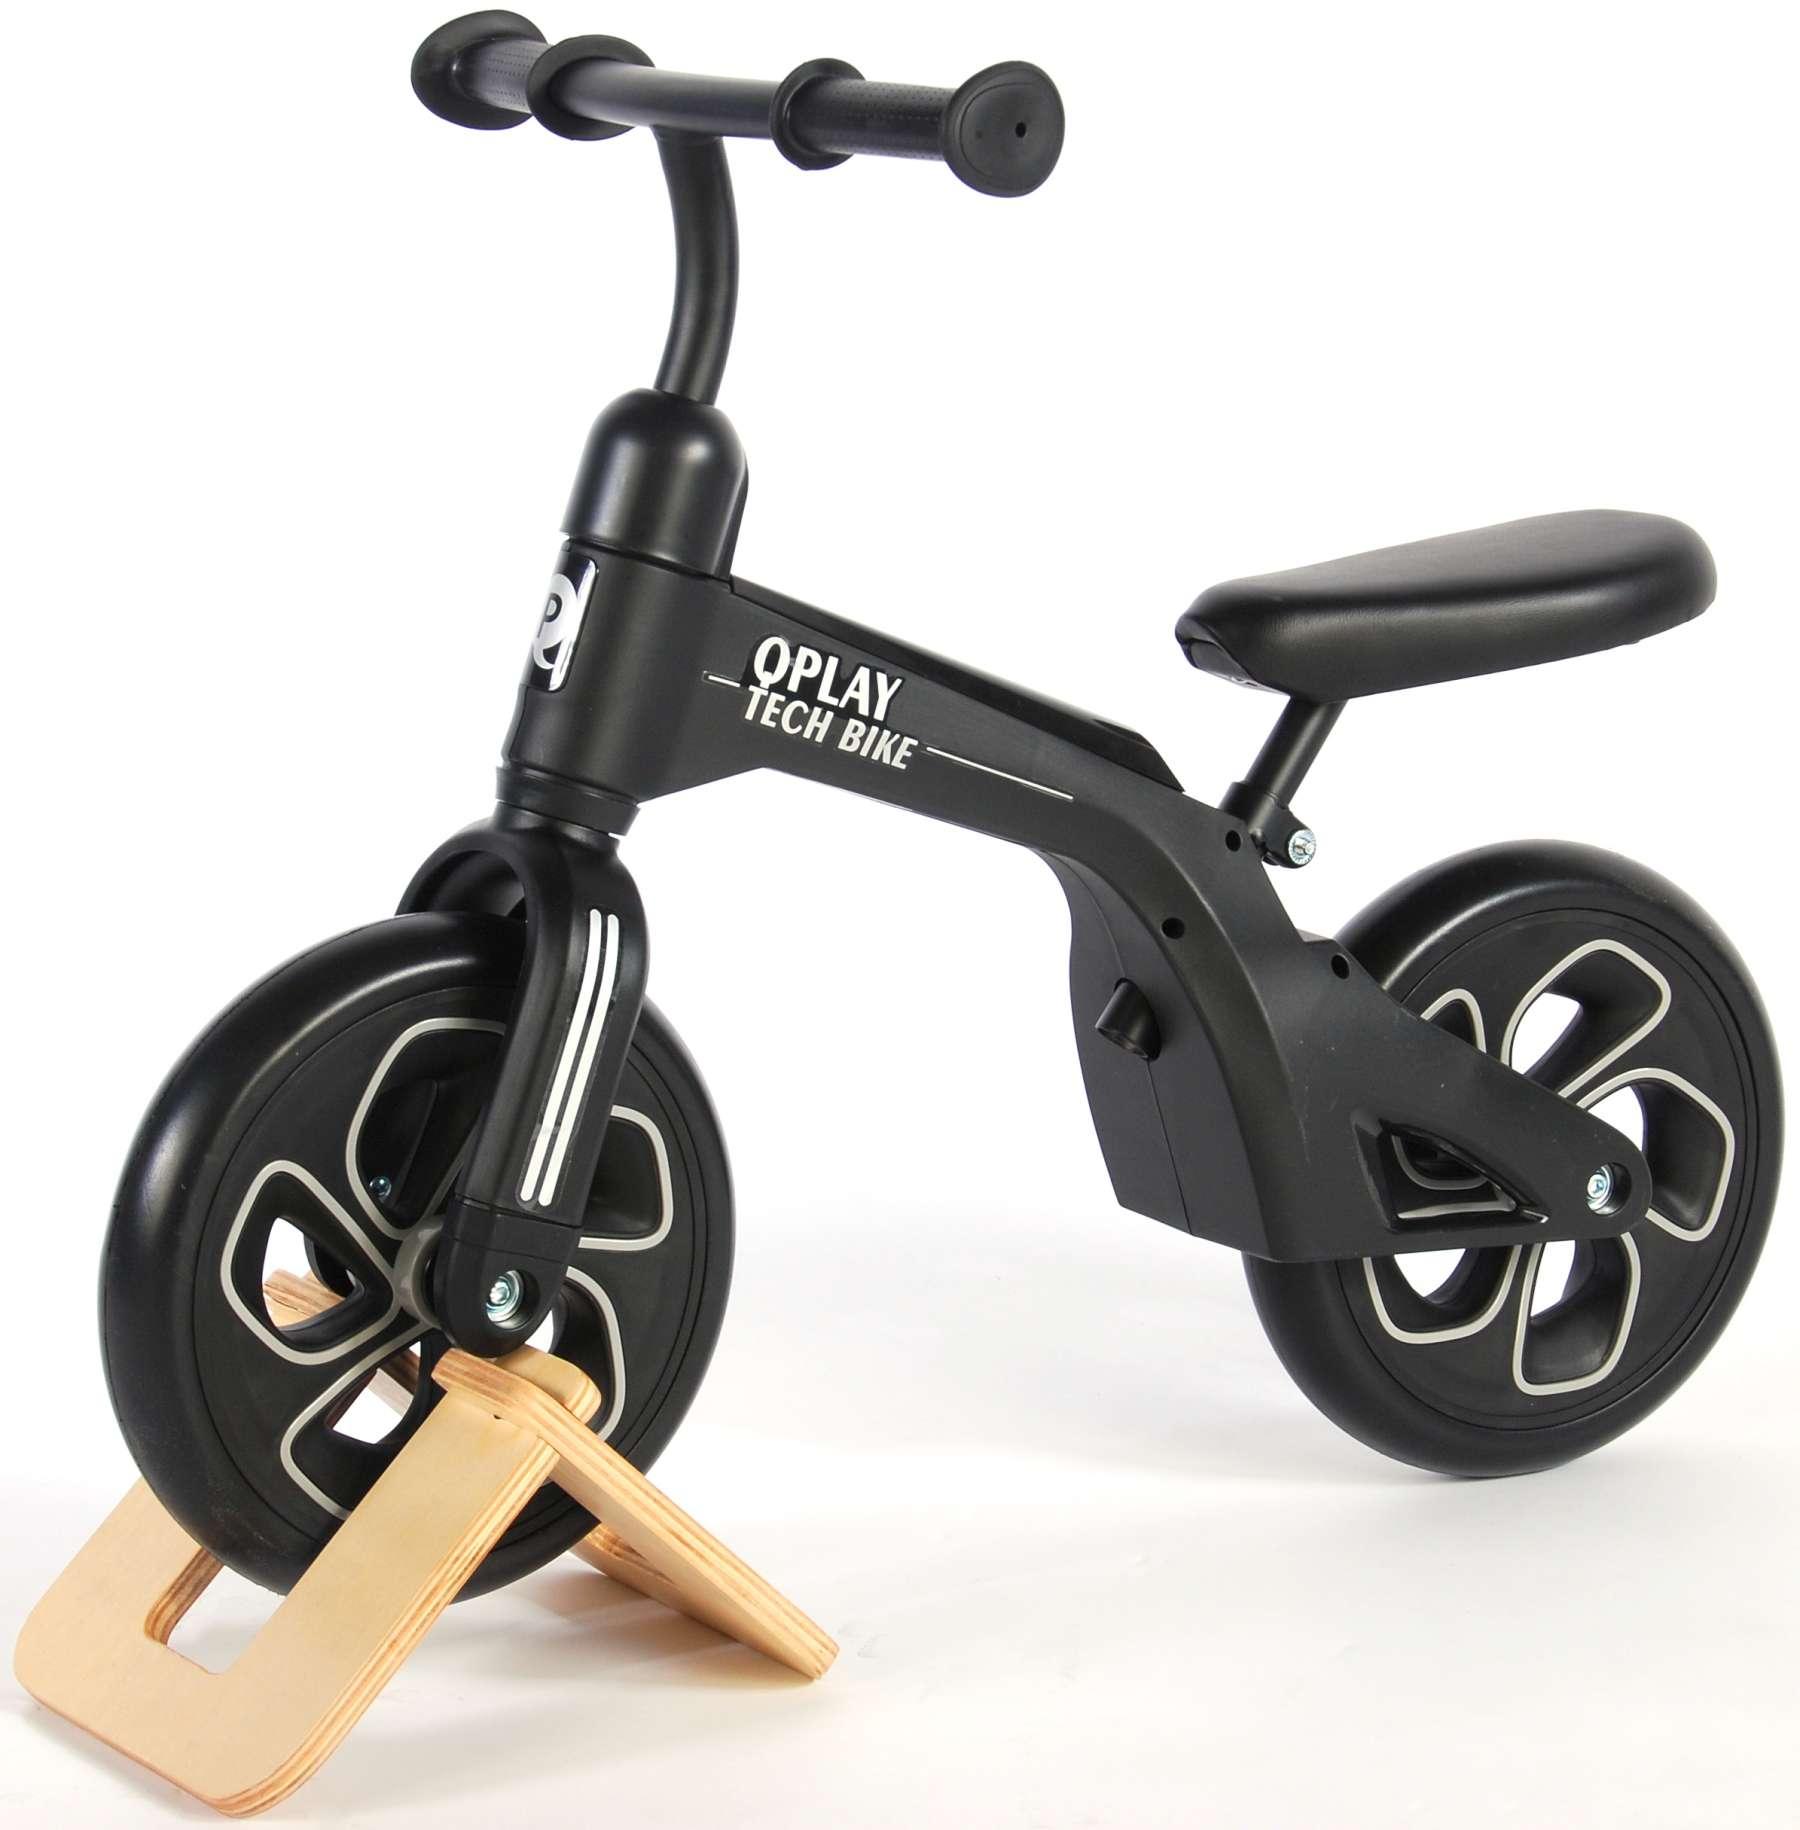 Bicicleta evolutiva QPlay Balance 10 pulgadas Roja - vista lateral izq.